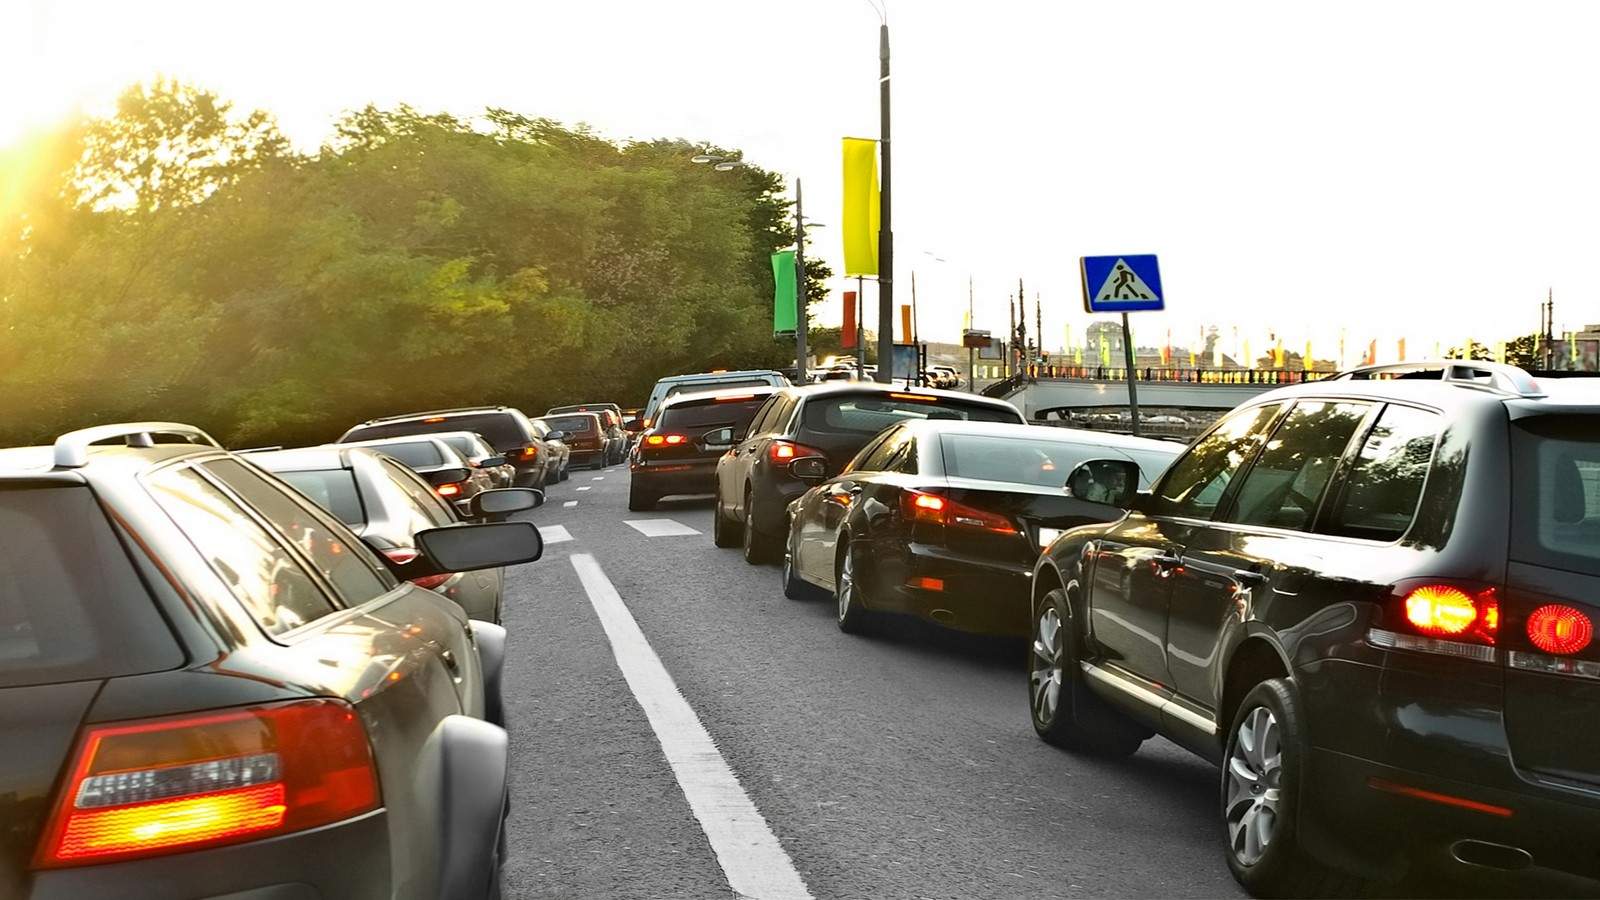 сколько времени займет езда кредит на авто в беларусбанке